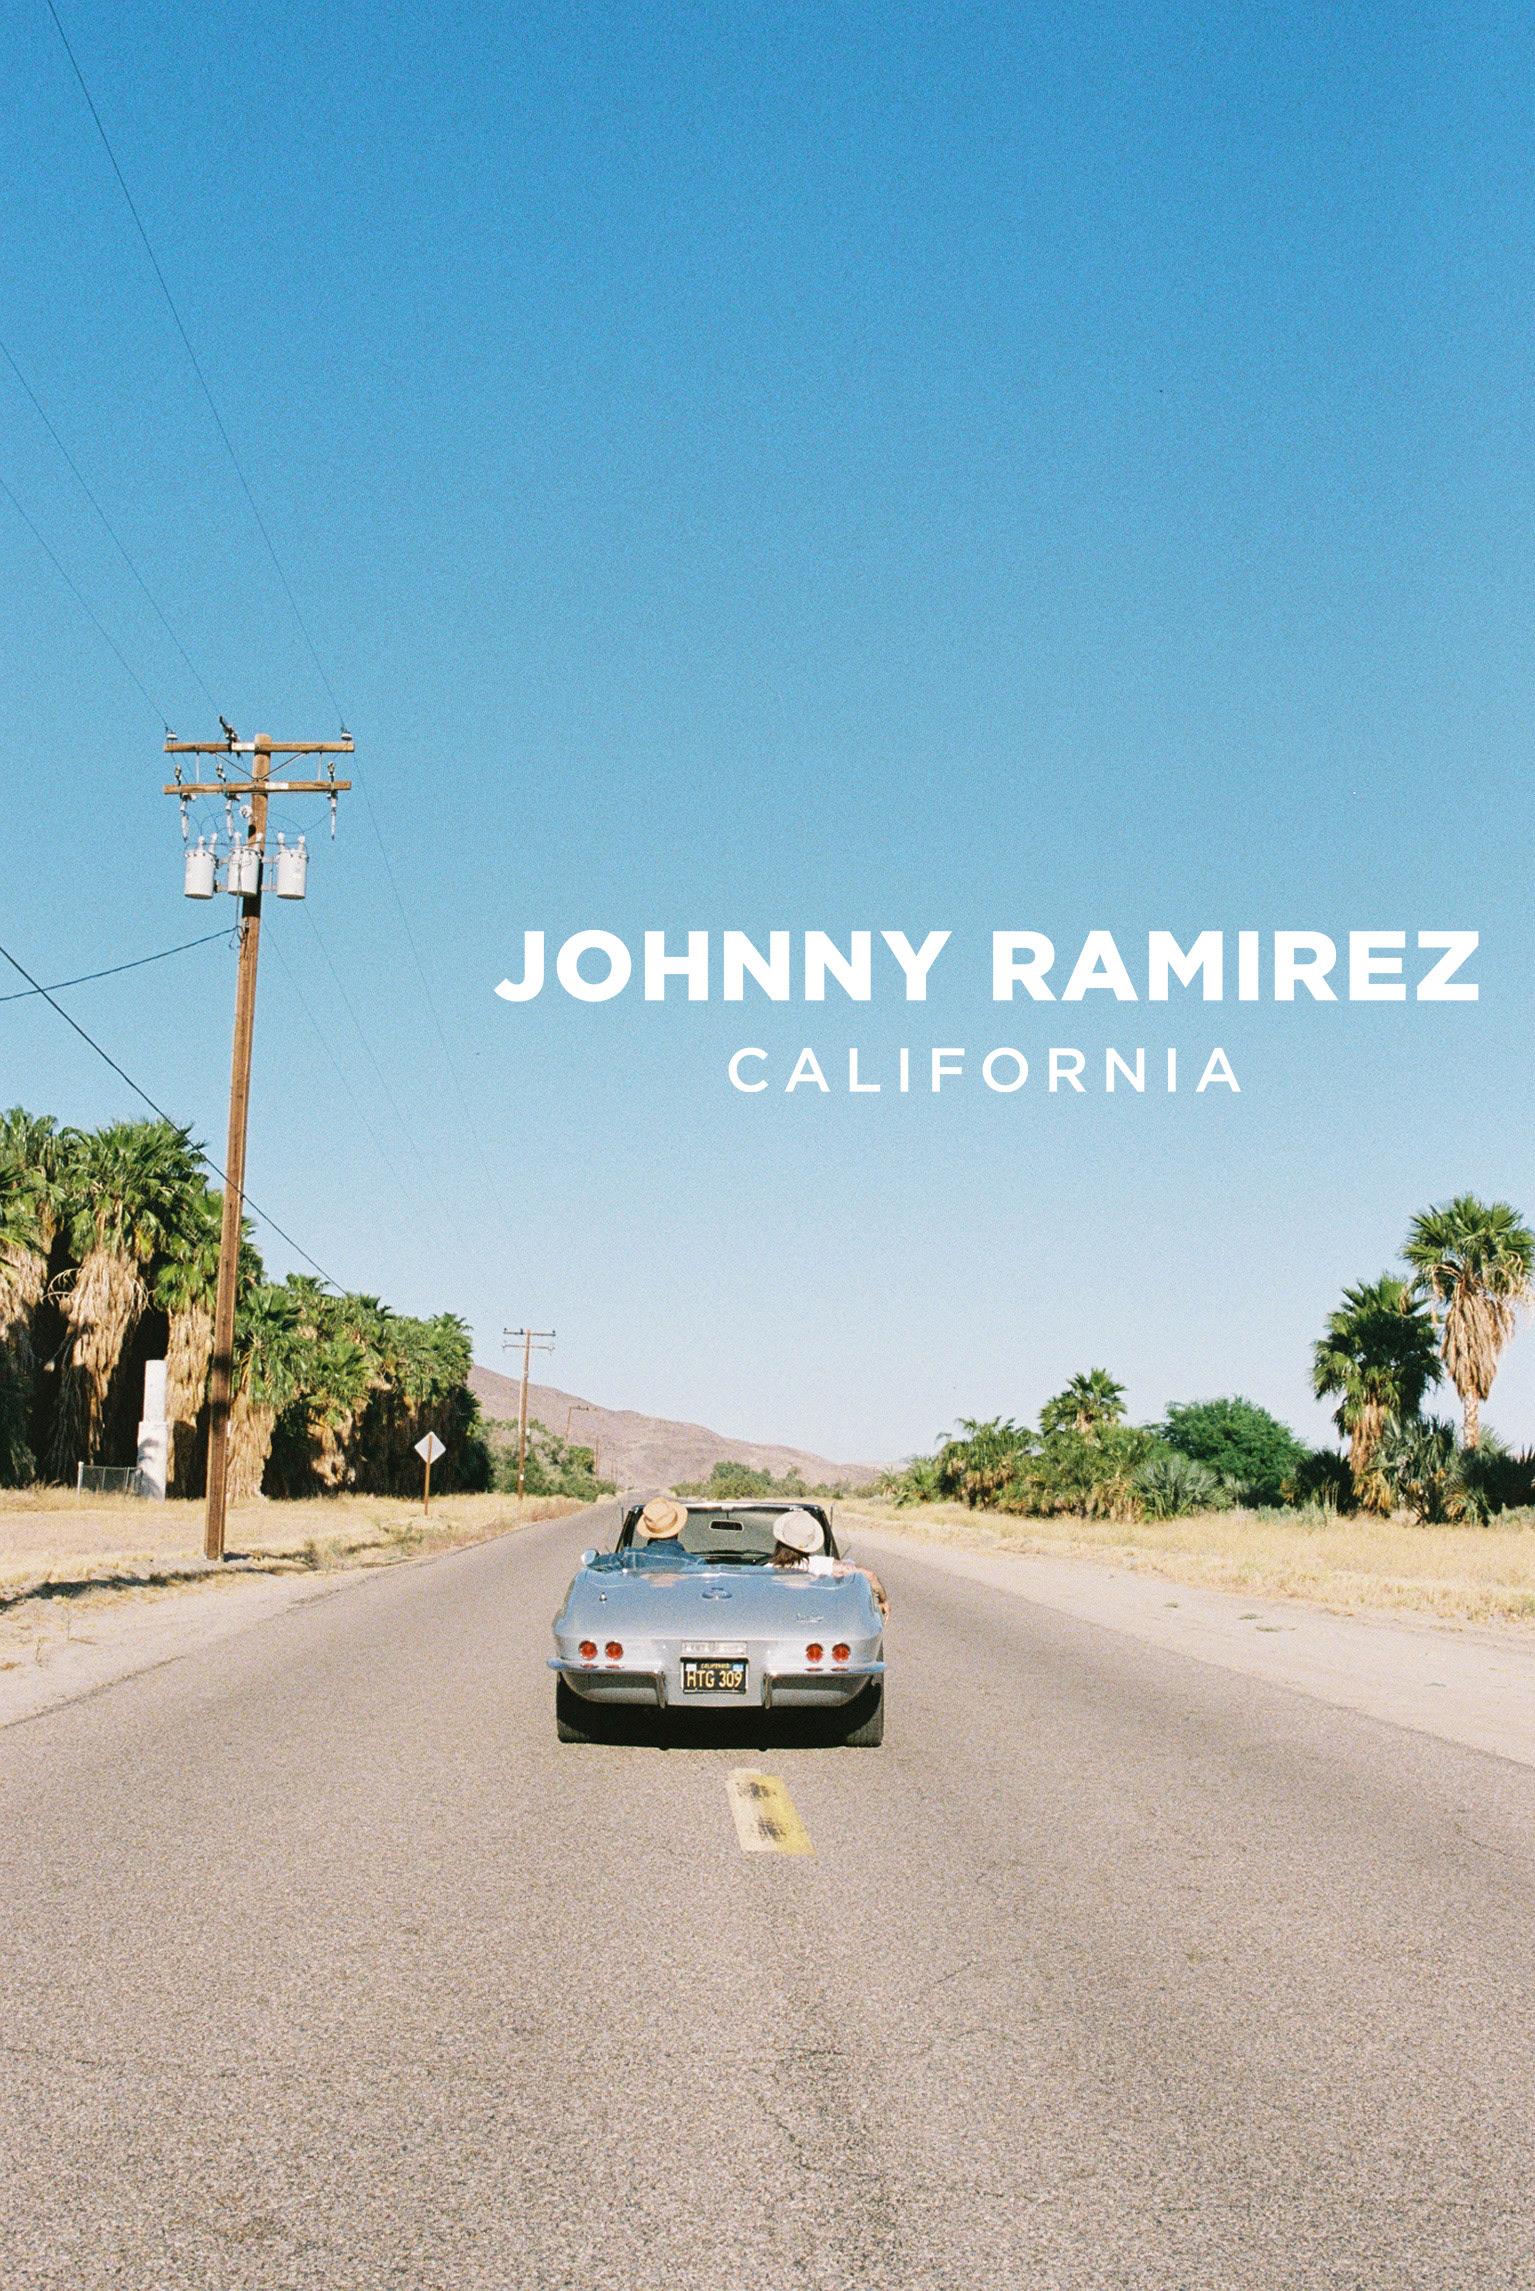 Johnny Ramirez California